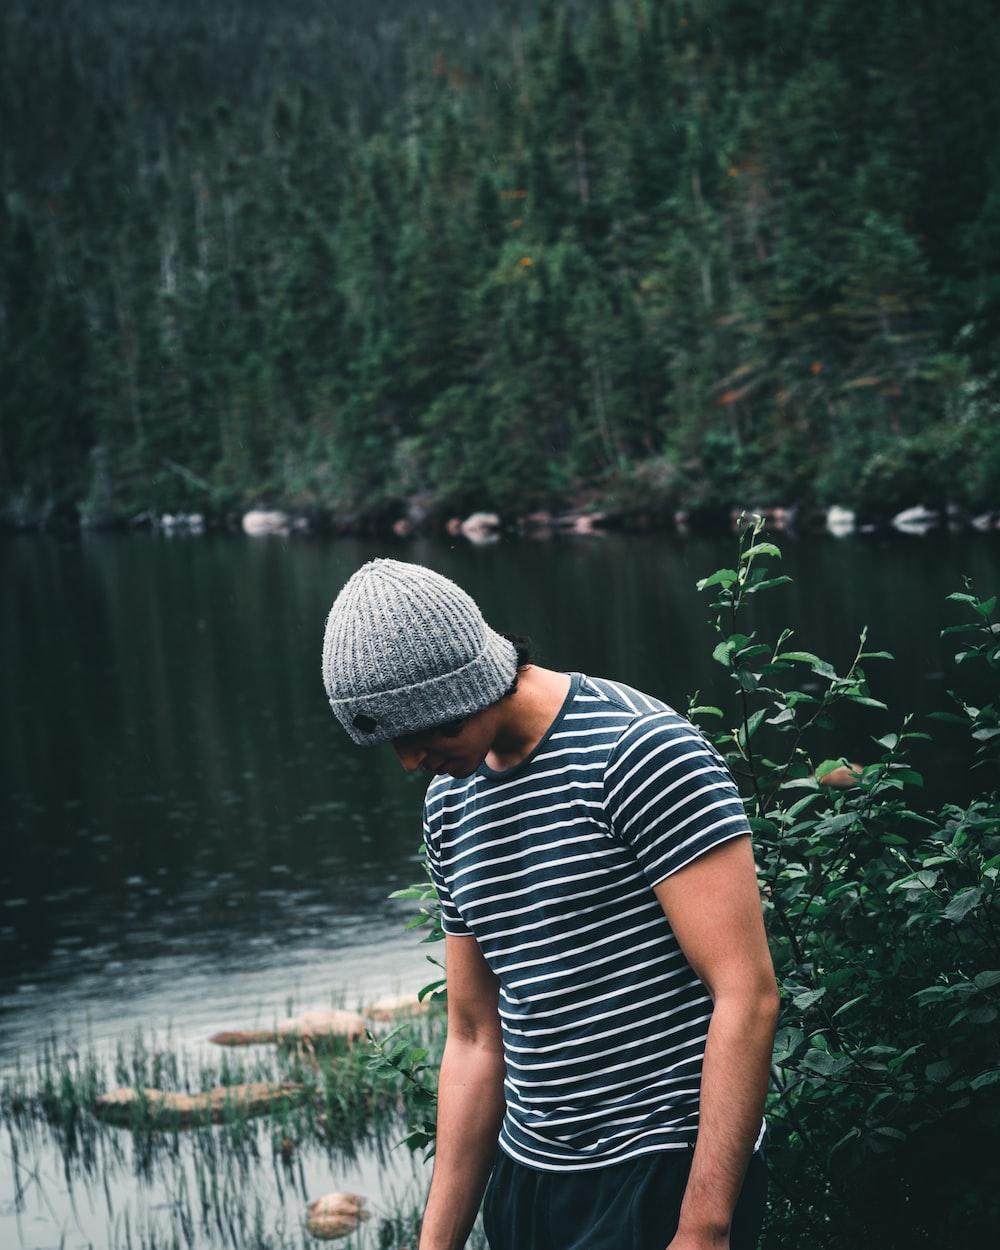 woman in black and white stripe shirt standing near lake during daytime